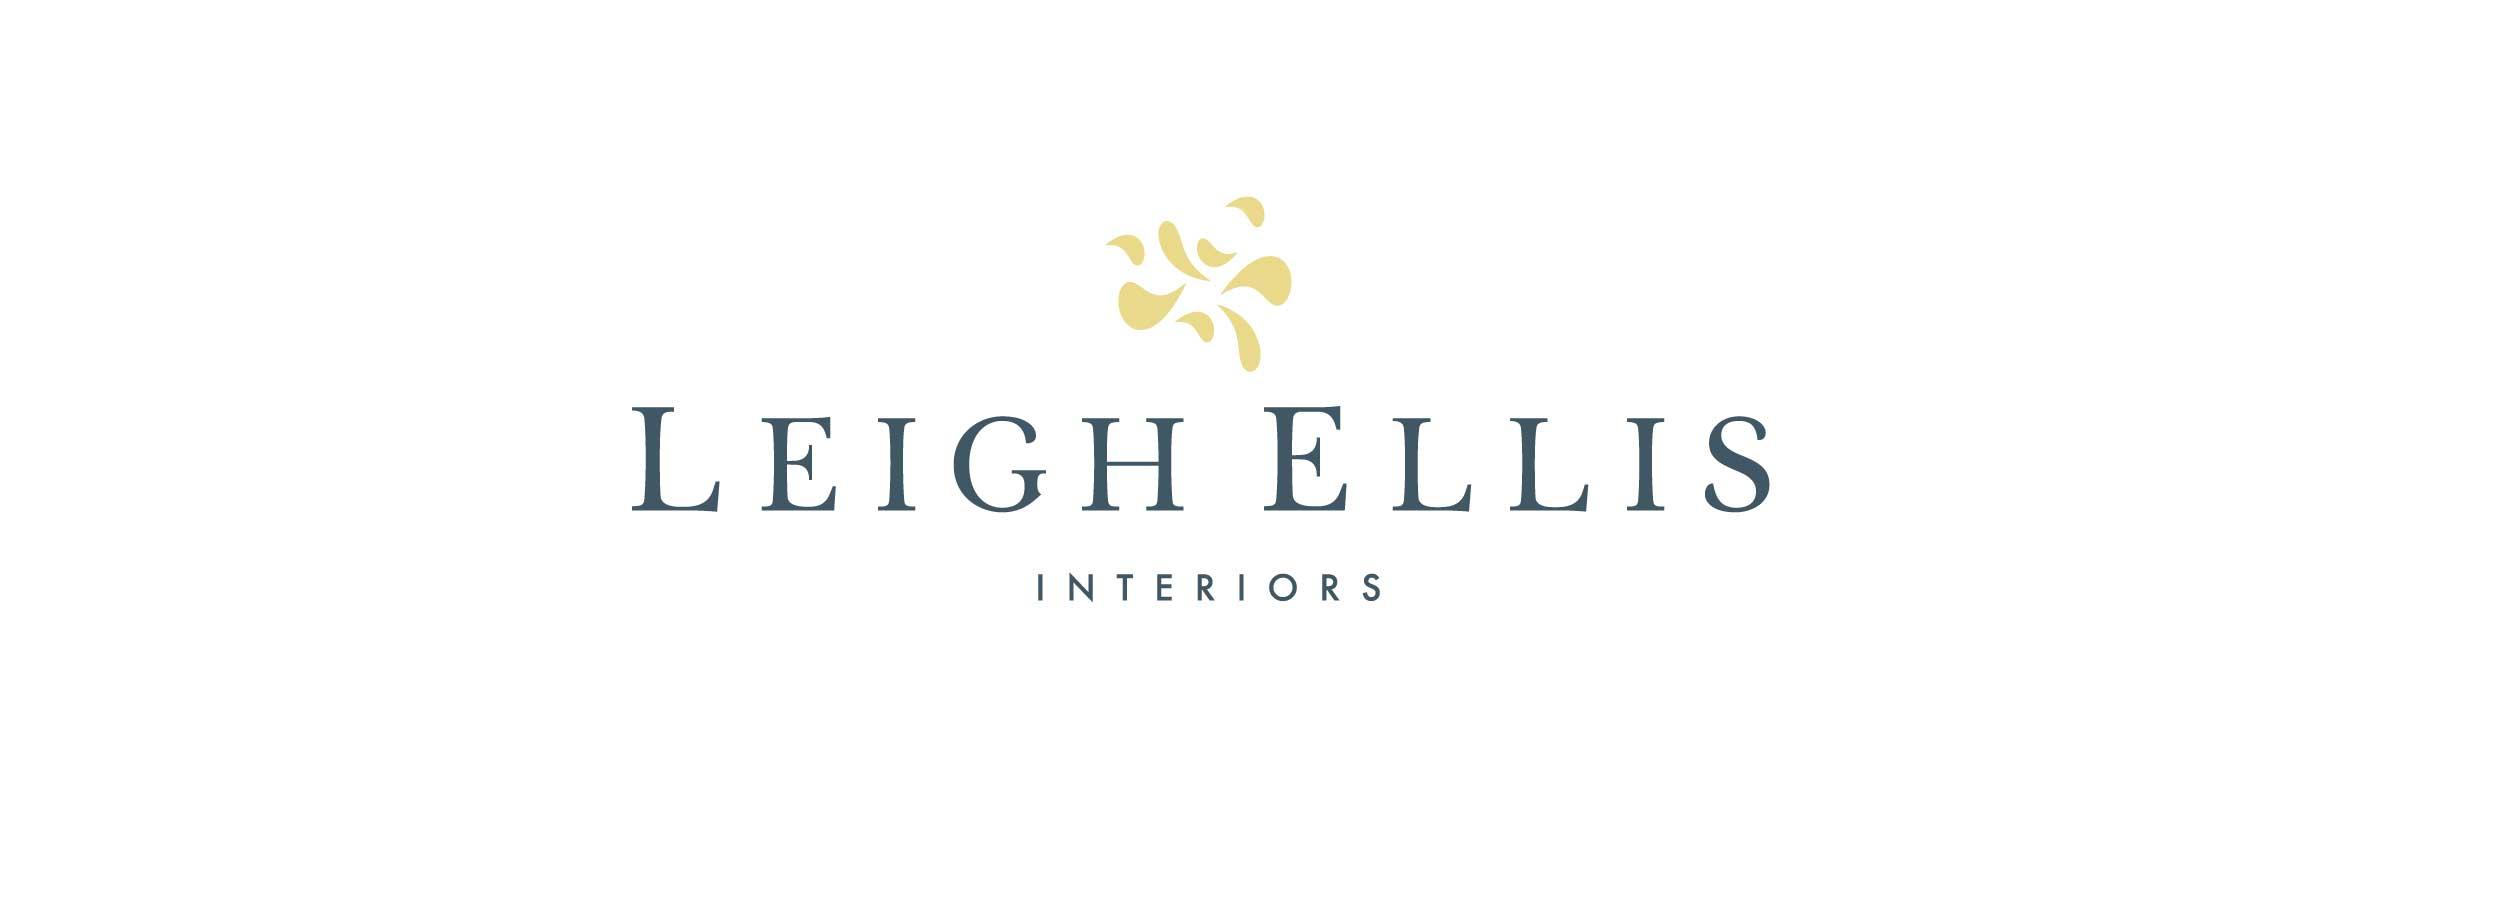 leigh ellis logo for LPW.jpg